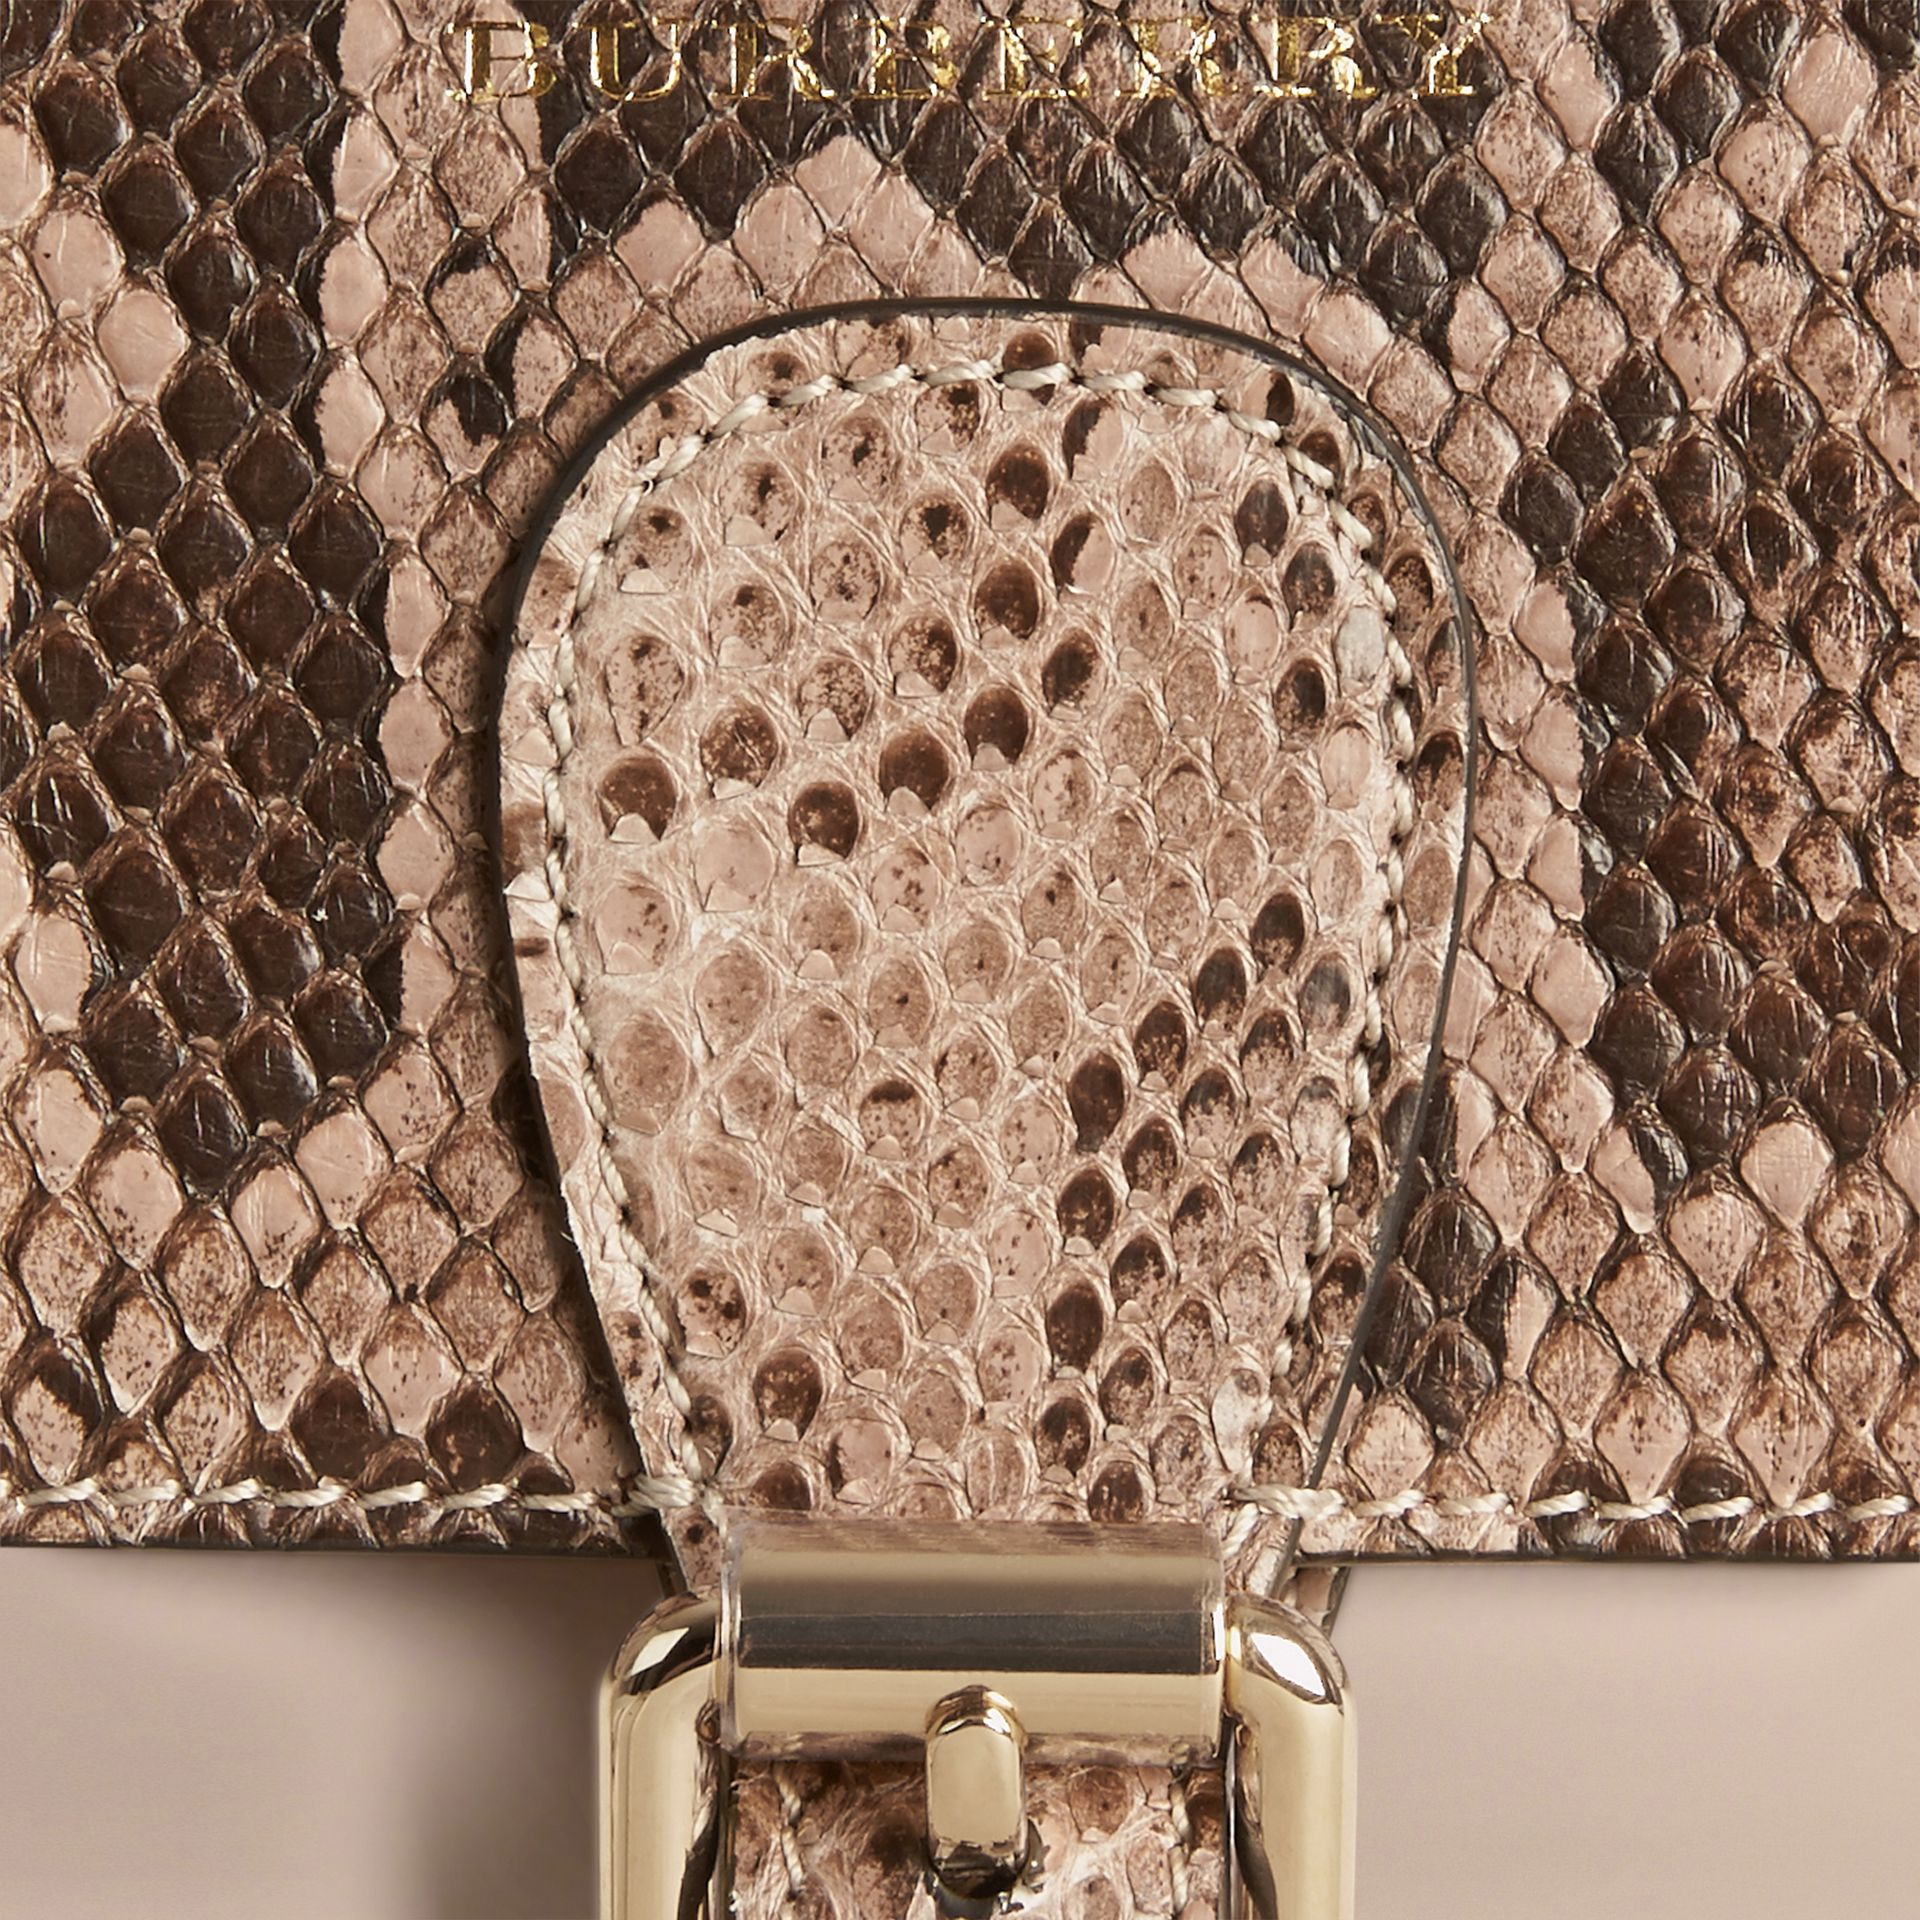 Steinfarben The Small Saddle Bag aus Glattleder und Pythonleder - Galerie-Bild 2